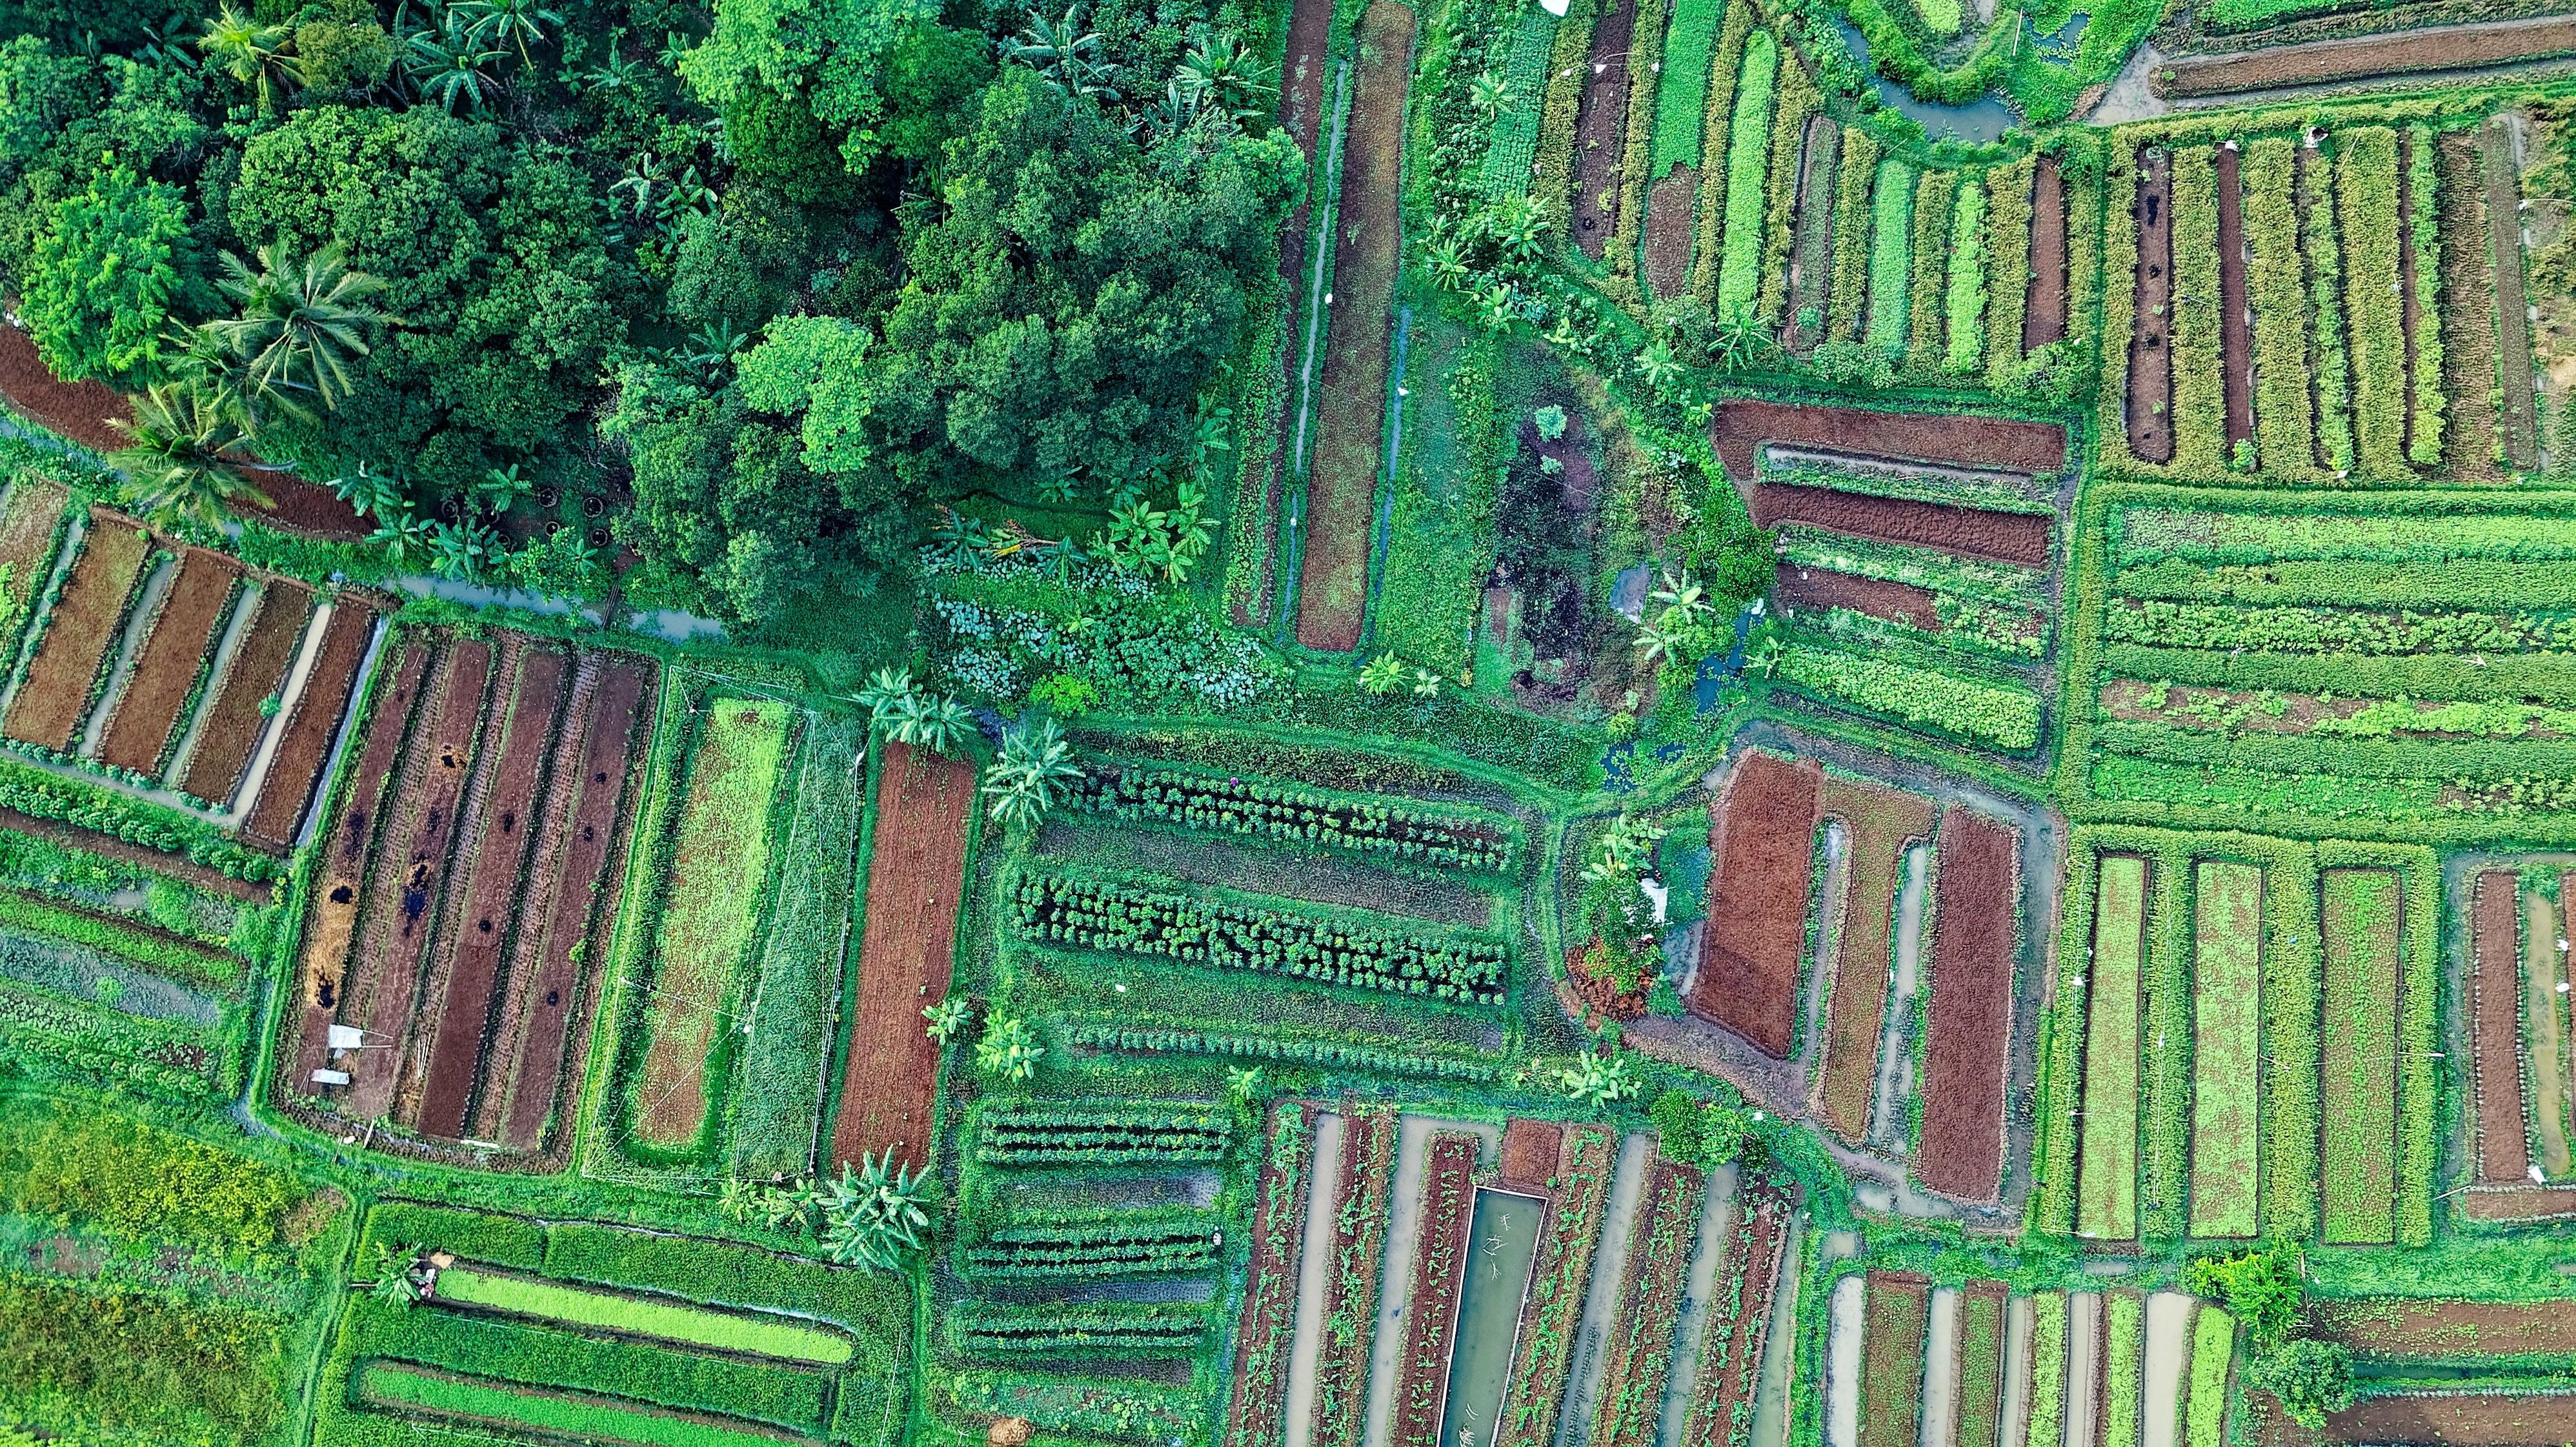 Curso de Extensión en Diseño de Huertos Agroecológicos Innovodores